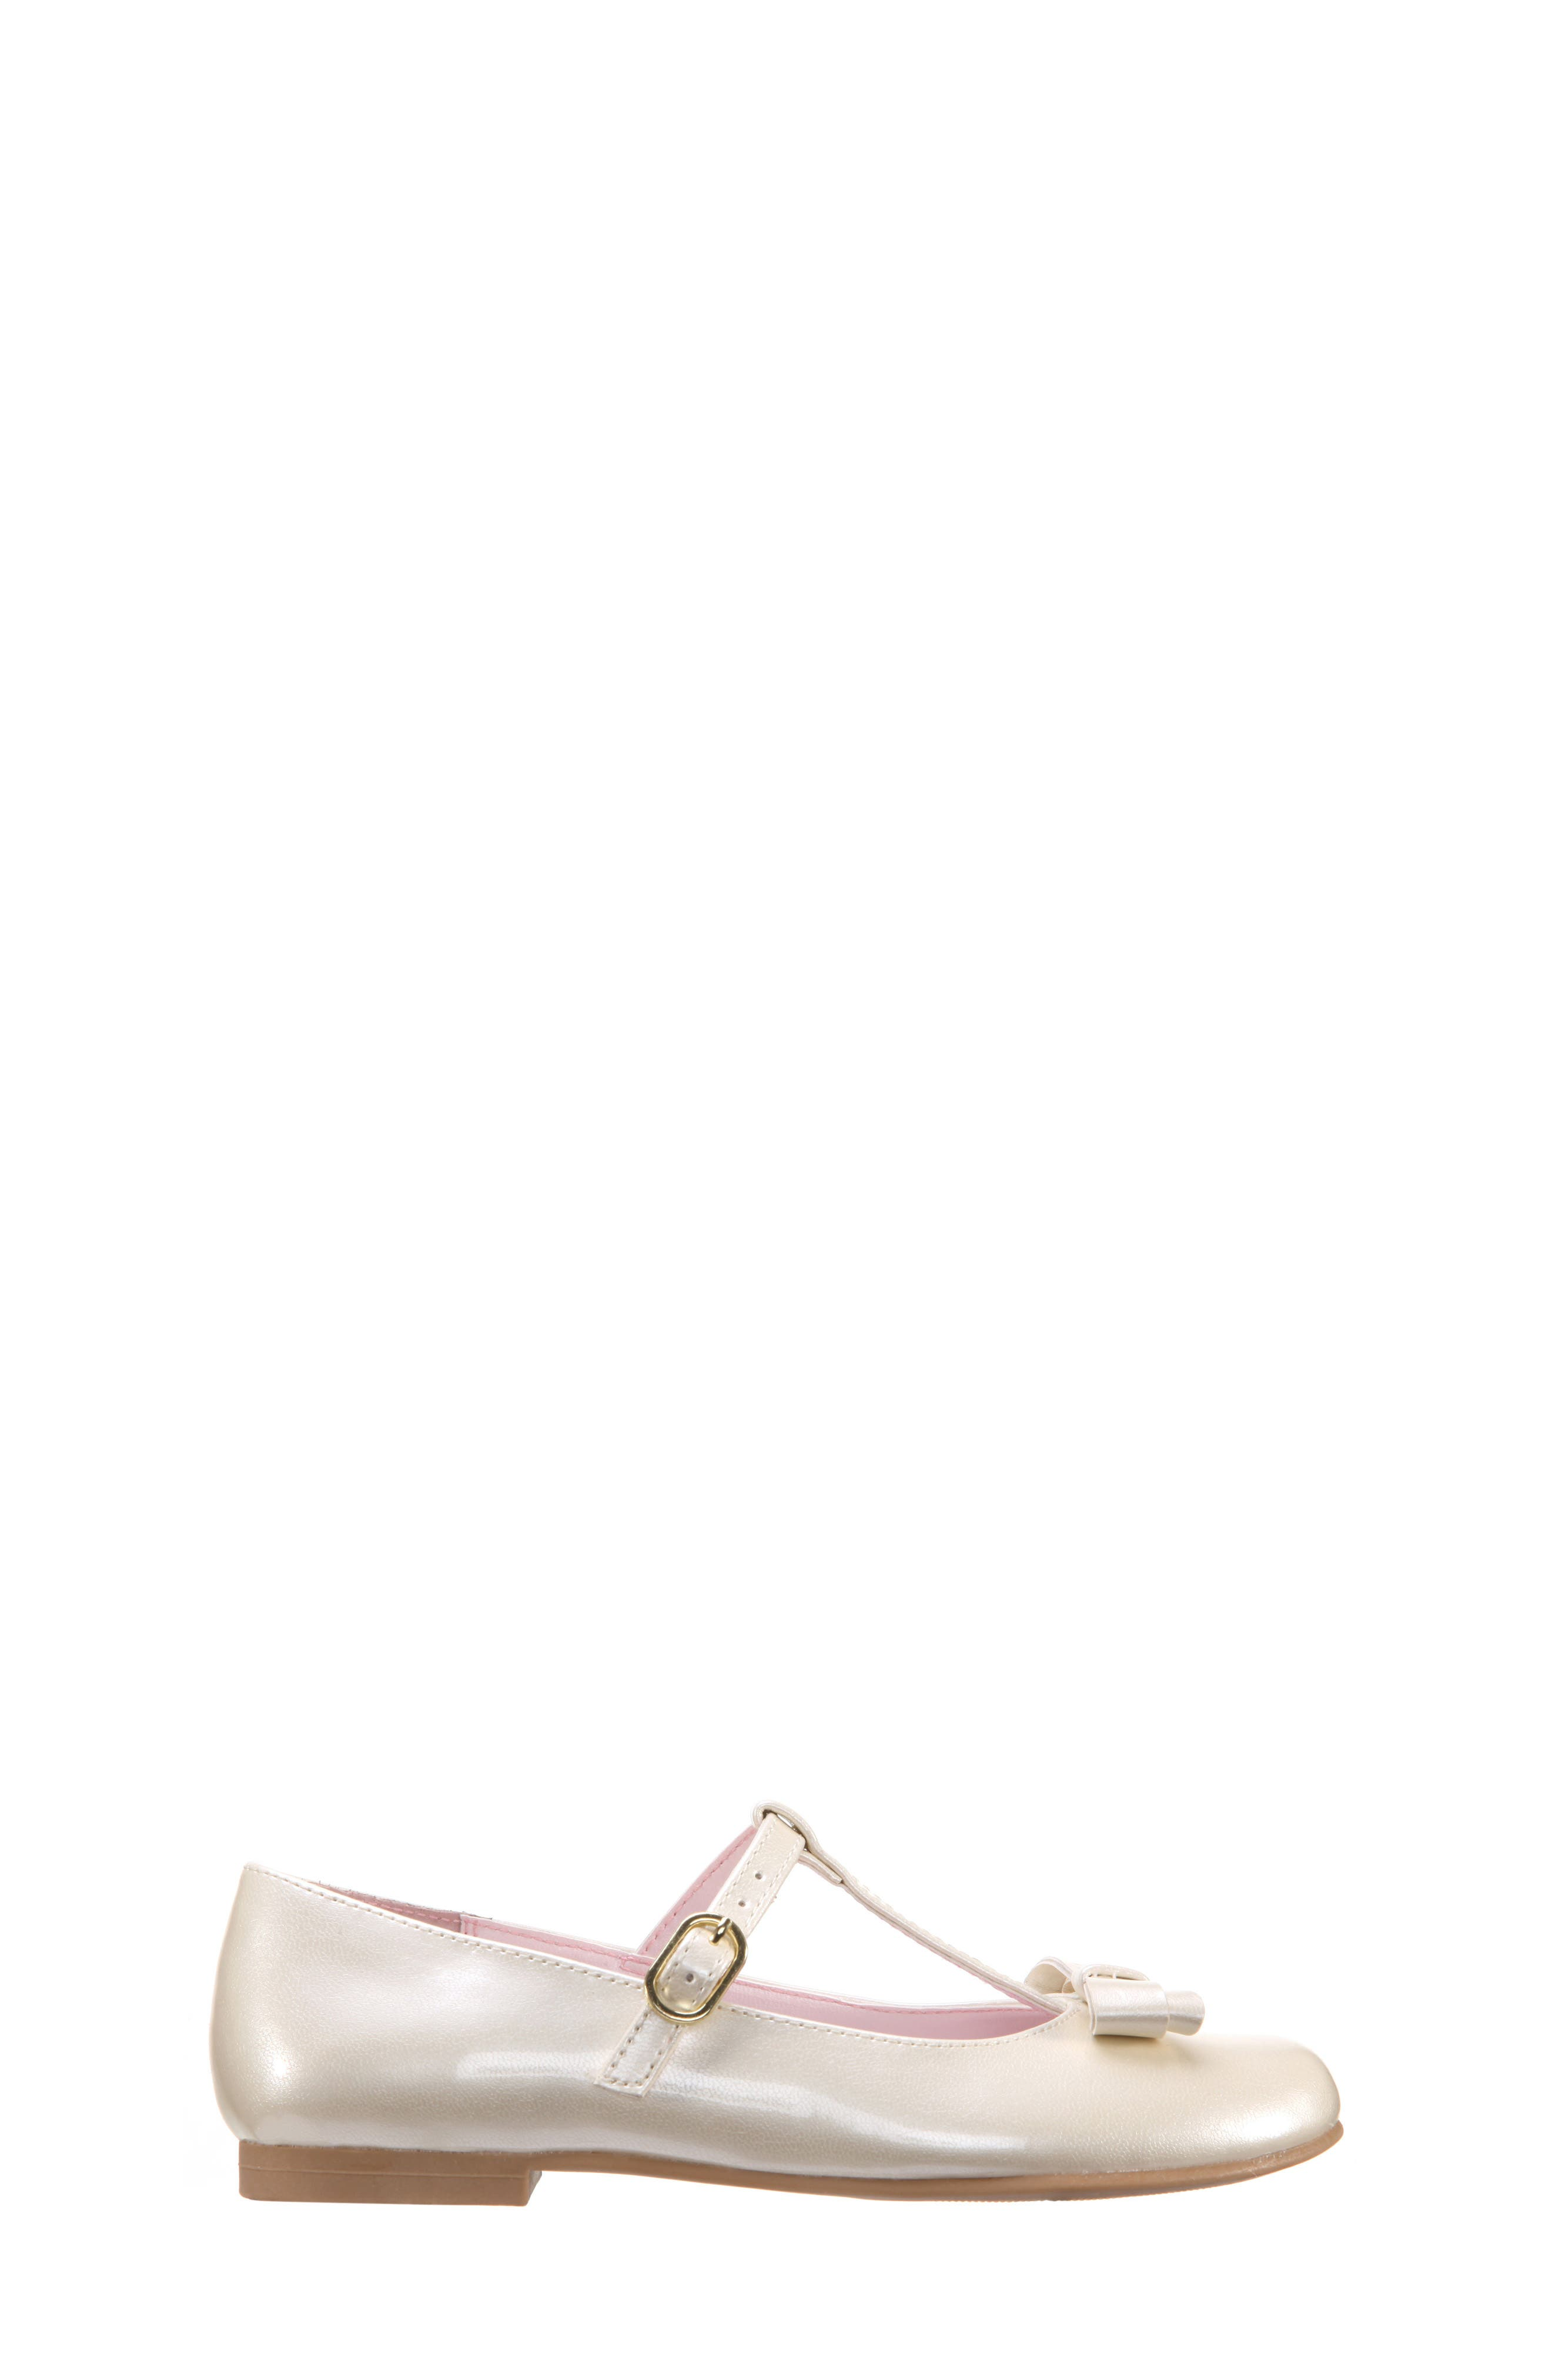 NINA, Merrilyn T-Strap Bow Flat, Alternate thumbnail 3, color, IVORY PATENT